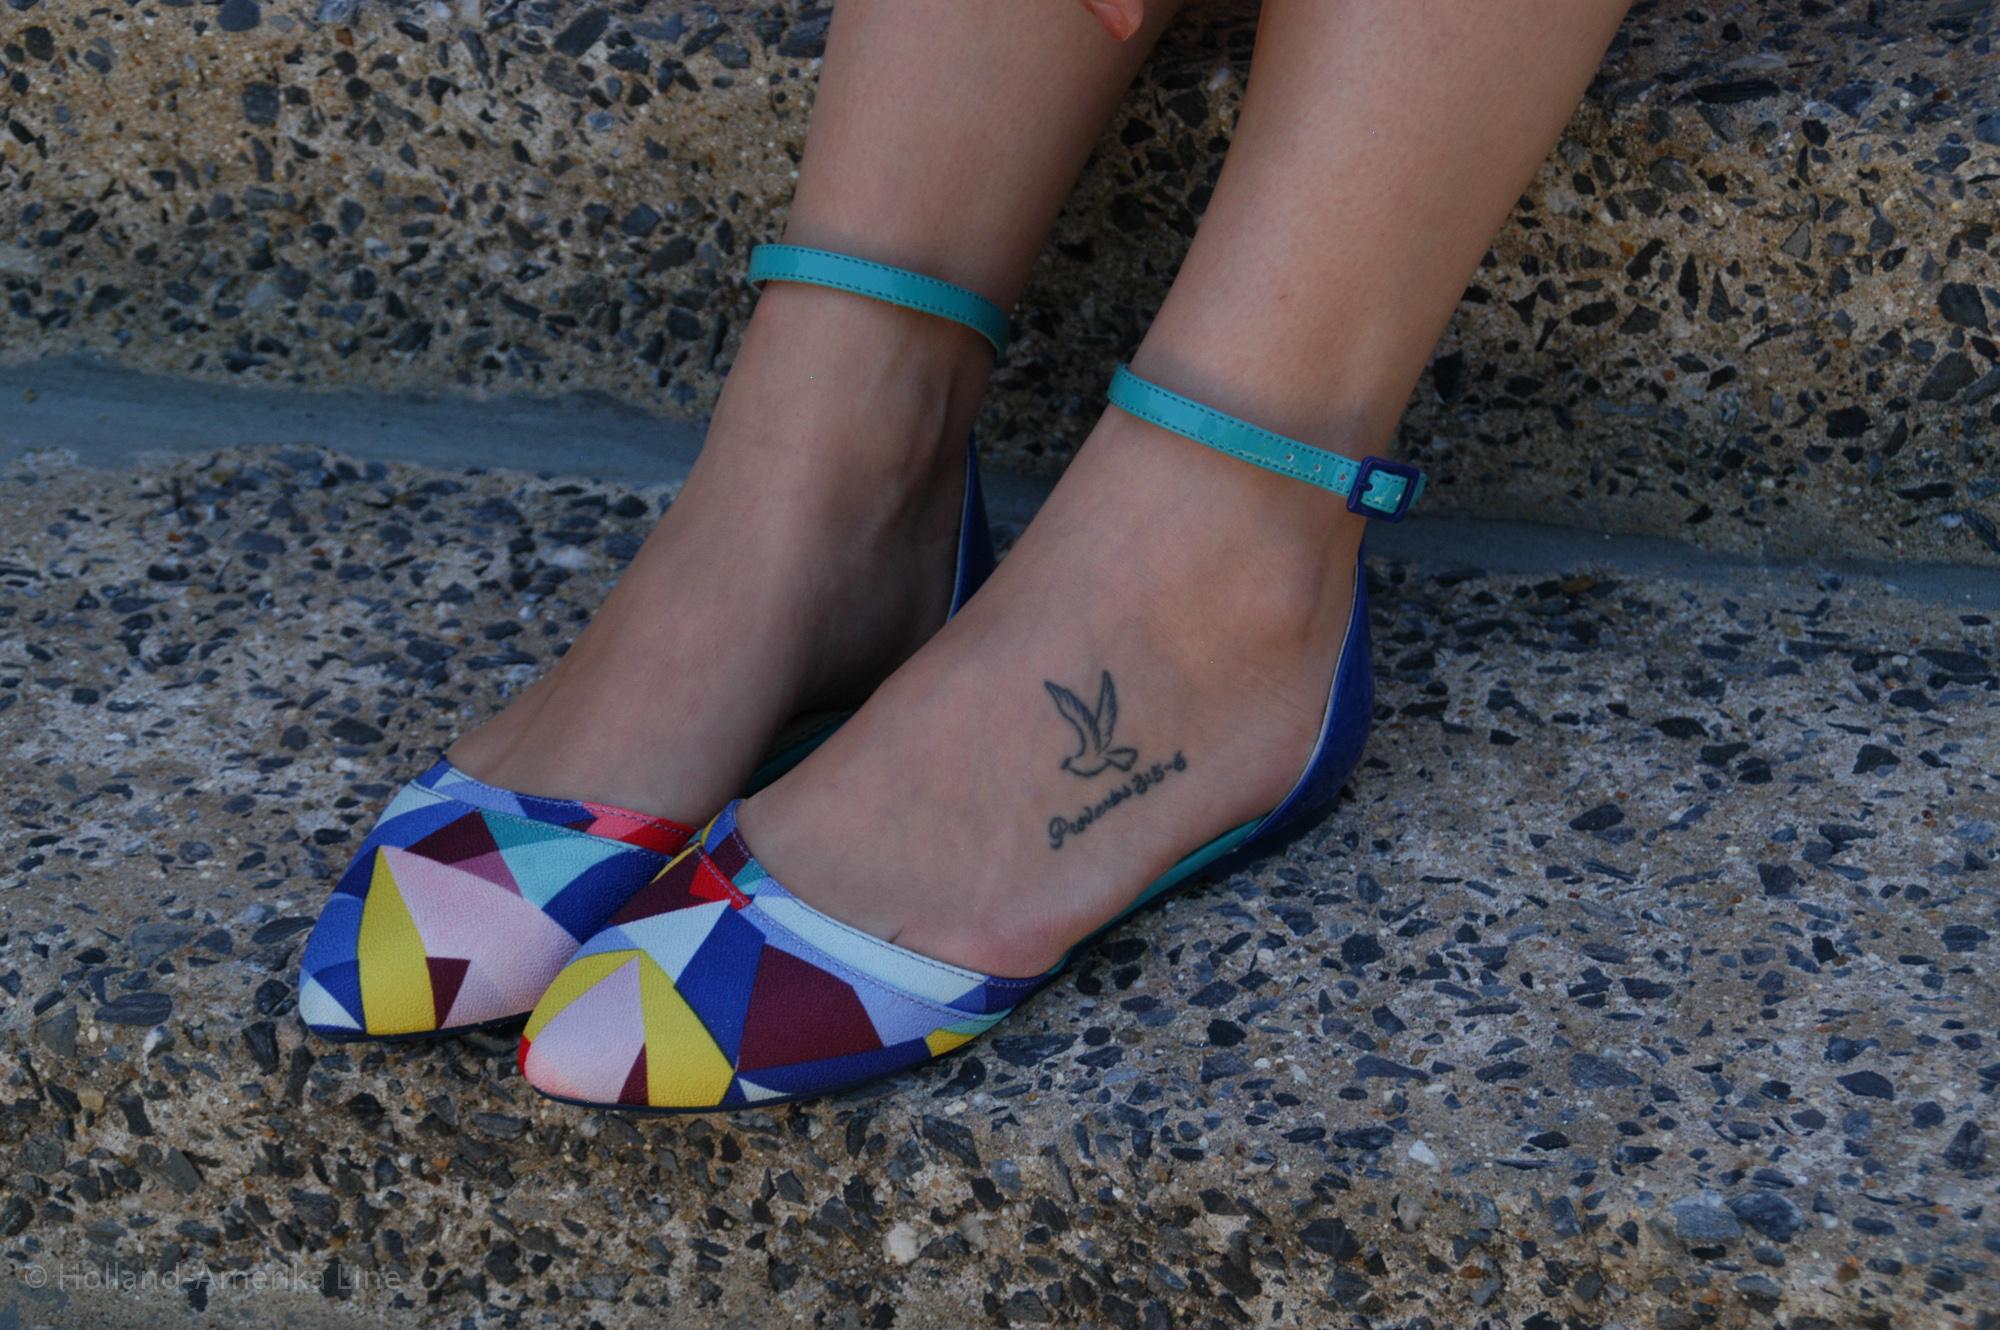 Dress: J.Crew | Shoes:  Poetic Licence | Bag; Kate Spade ( similar ) | Necklace: J.Crew | Watch:  Fossil  | Bracelets:  Alex & Ani , Baublebar, Forever21 | Glasses:  RayBan